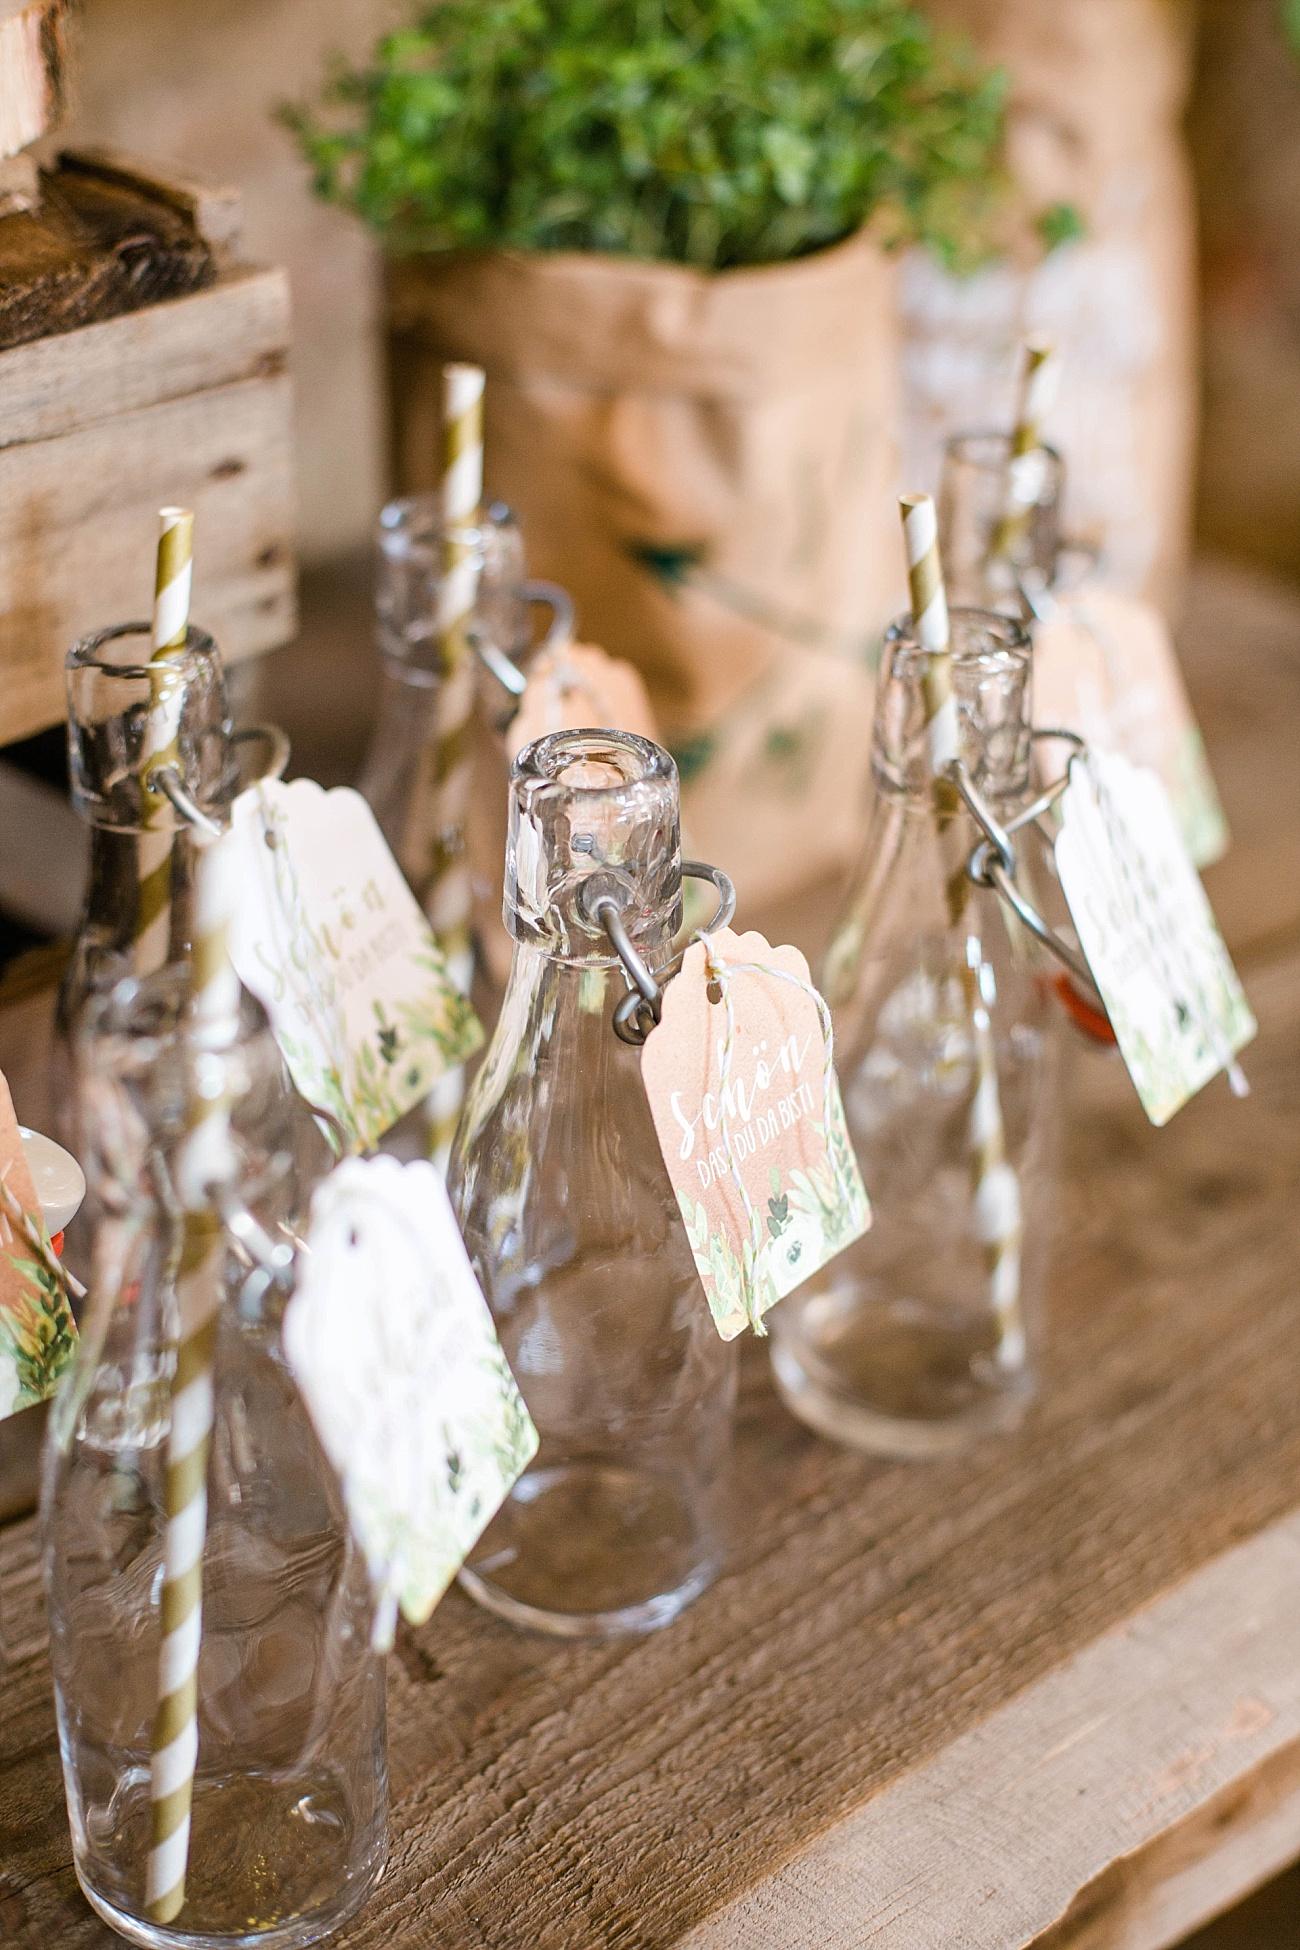 Getränkebar Hochzeit rustikal